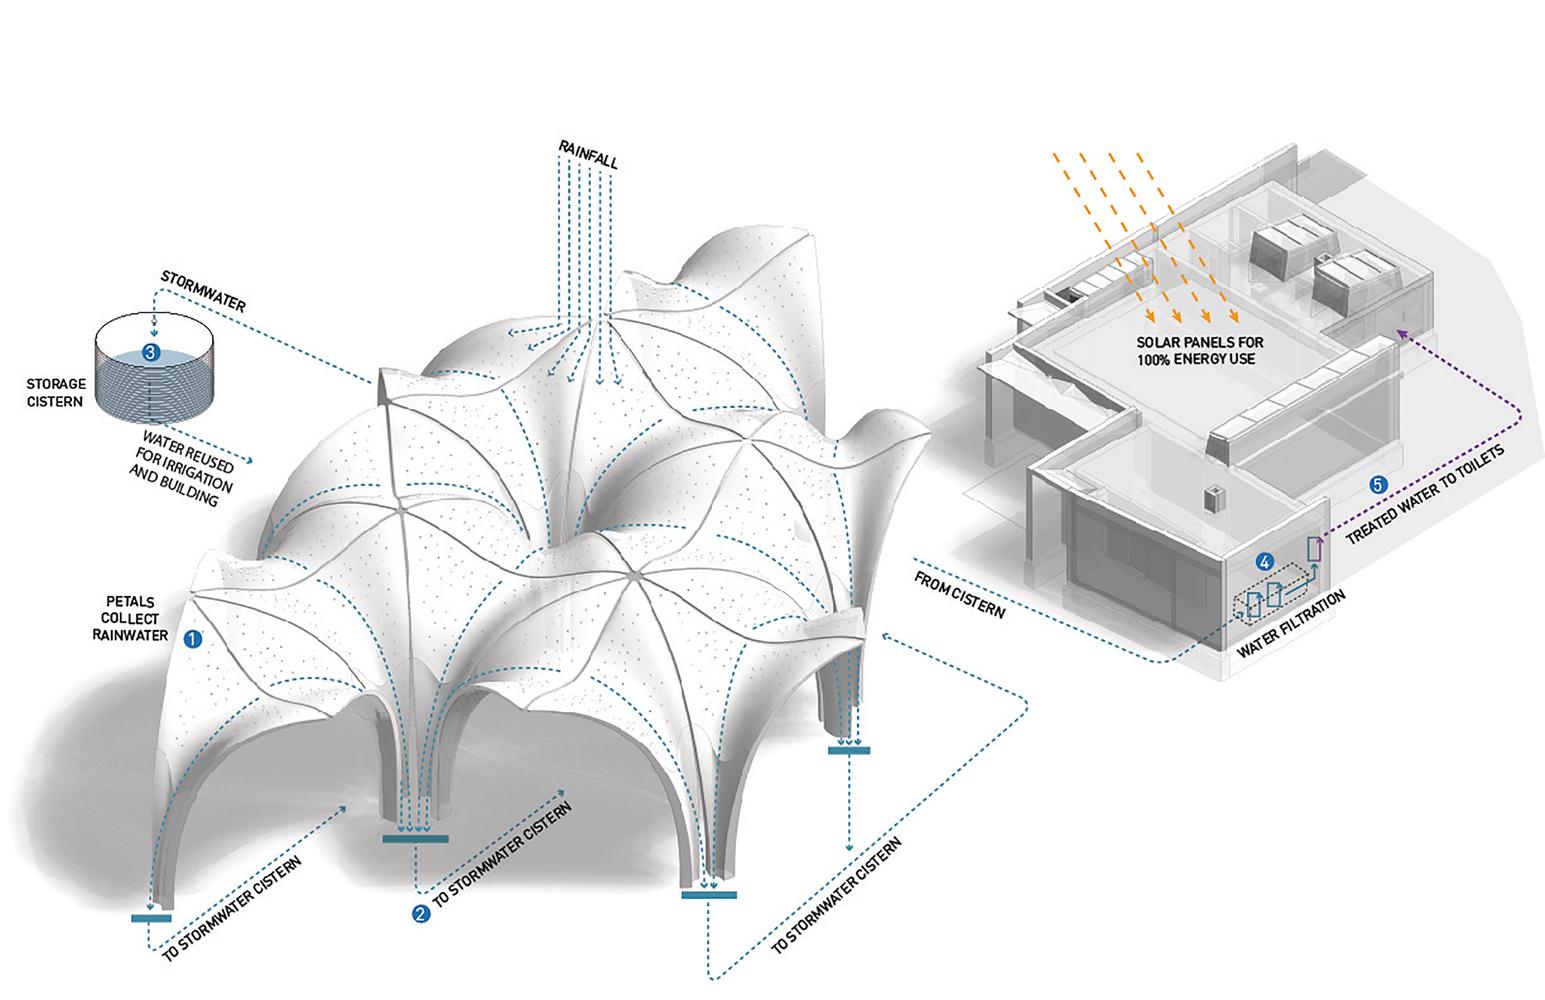 Consejos para aprovechar el agua de lluvia en proyectos de arquitectura,Vista Axonométrica. Image Cortesia de Lake|Flato Architects + Matsys Design